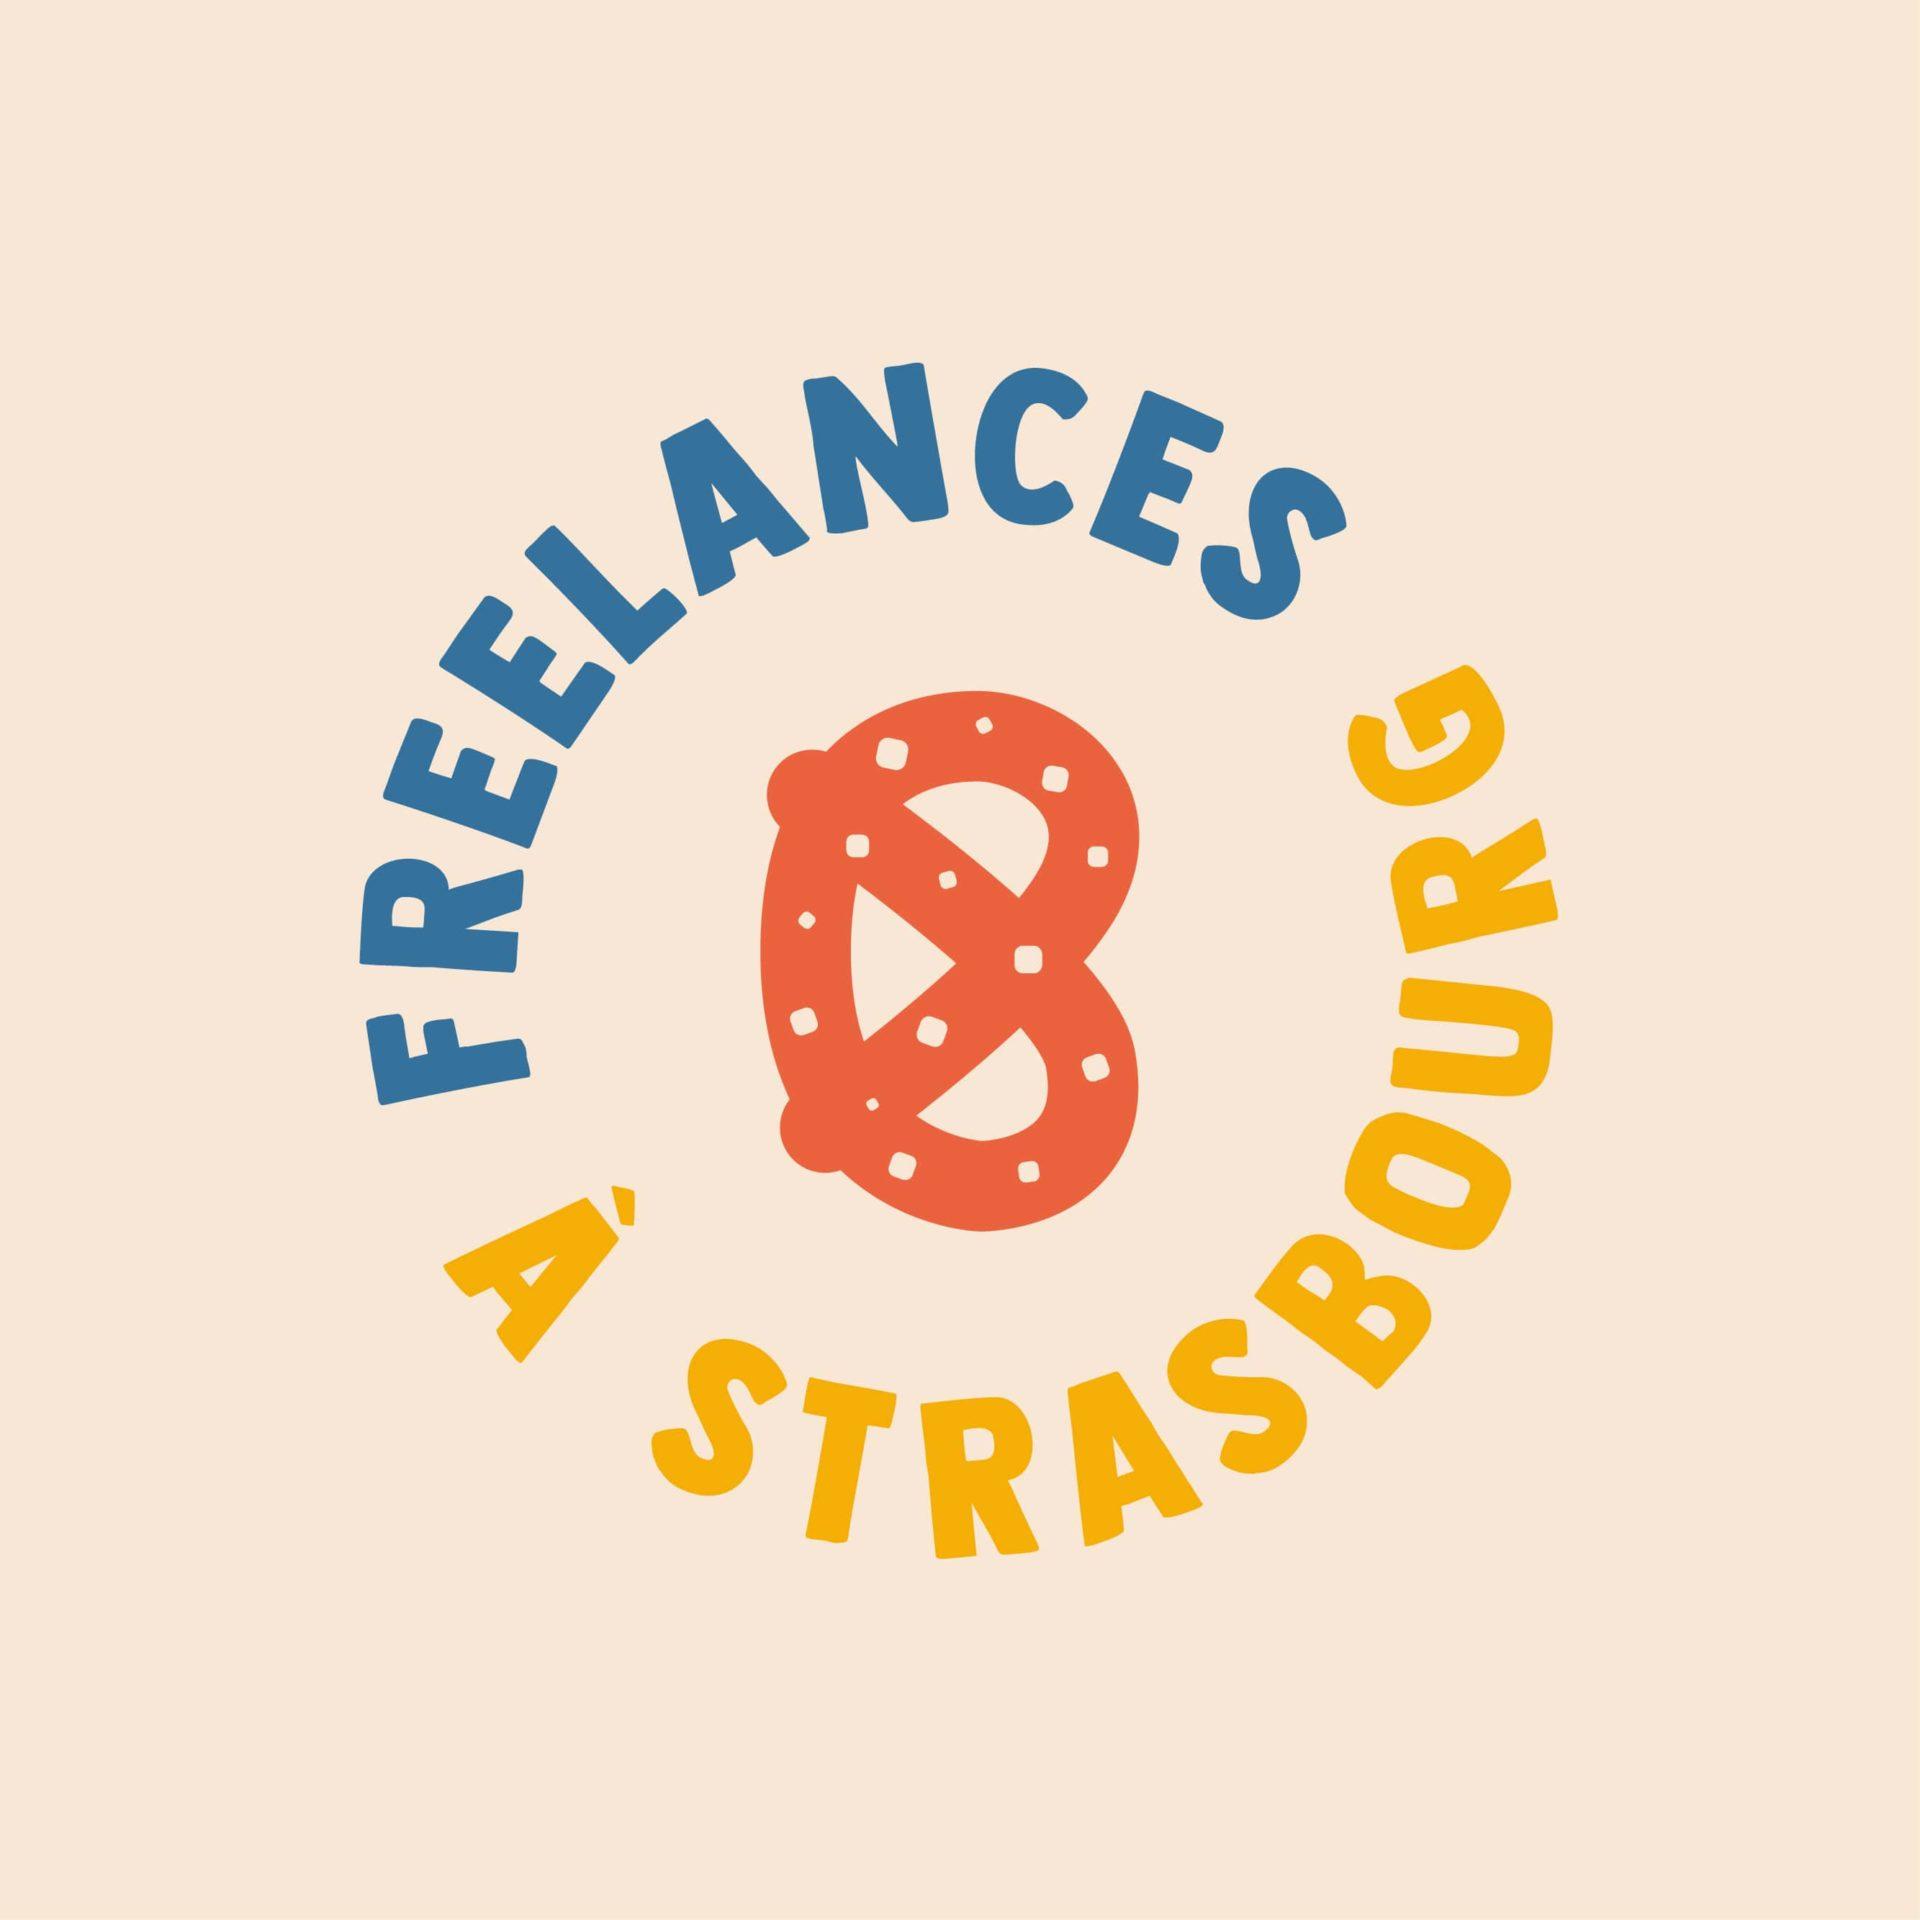 freelances-a-strasbourg